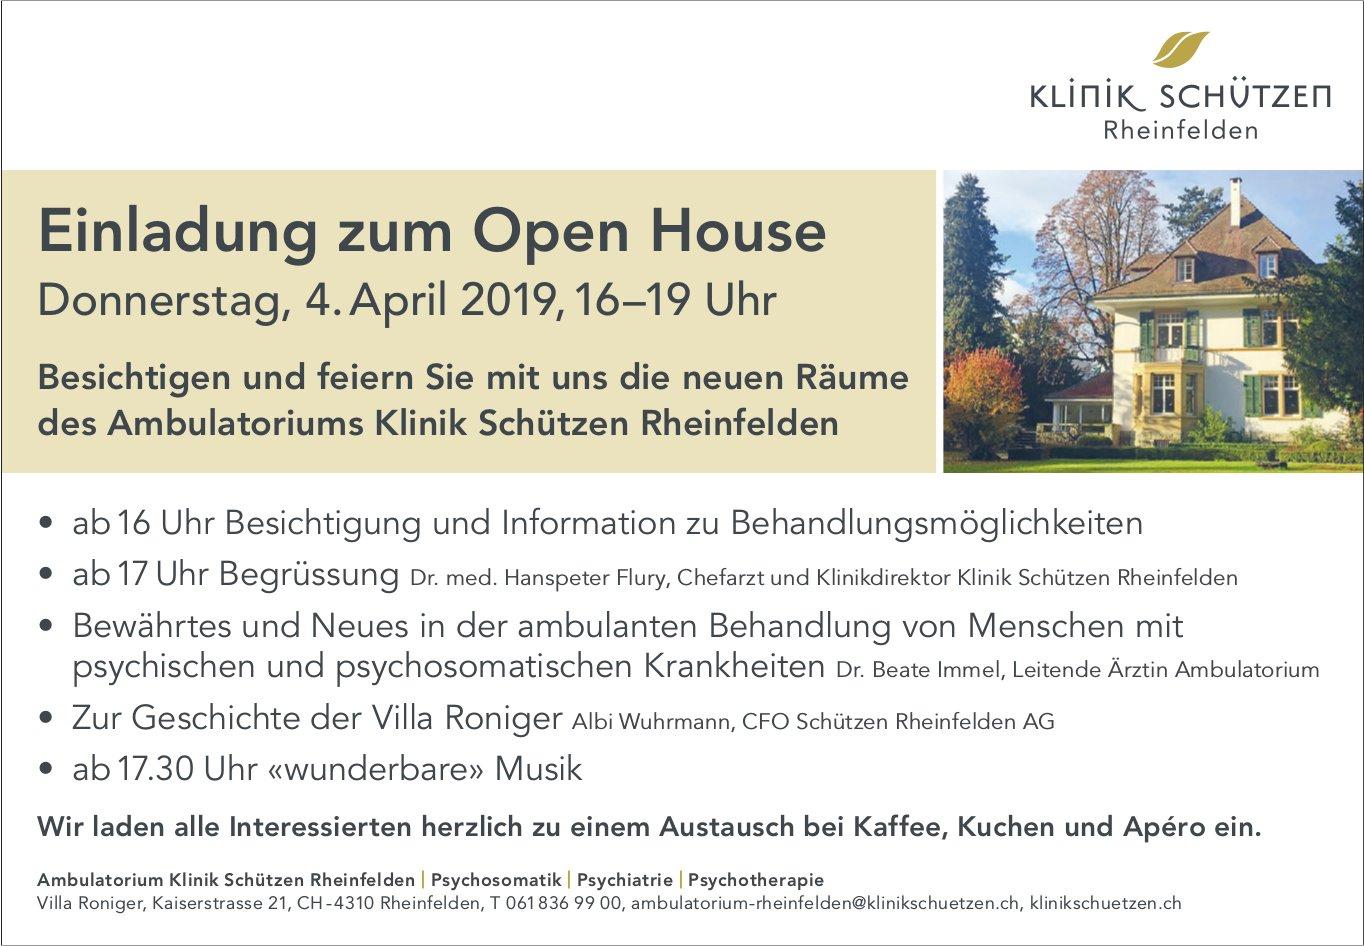 Ambulatorium Klinik Schützen Rheinfelden - Einladung zum Open House am 4. April